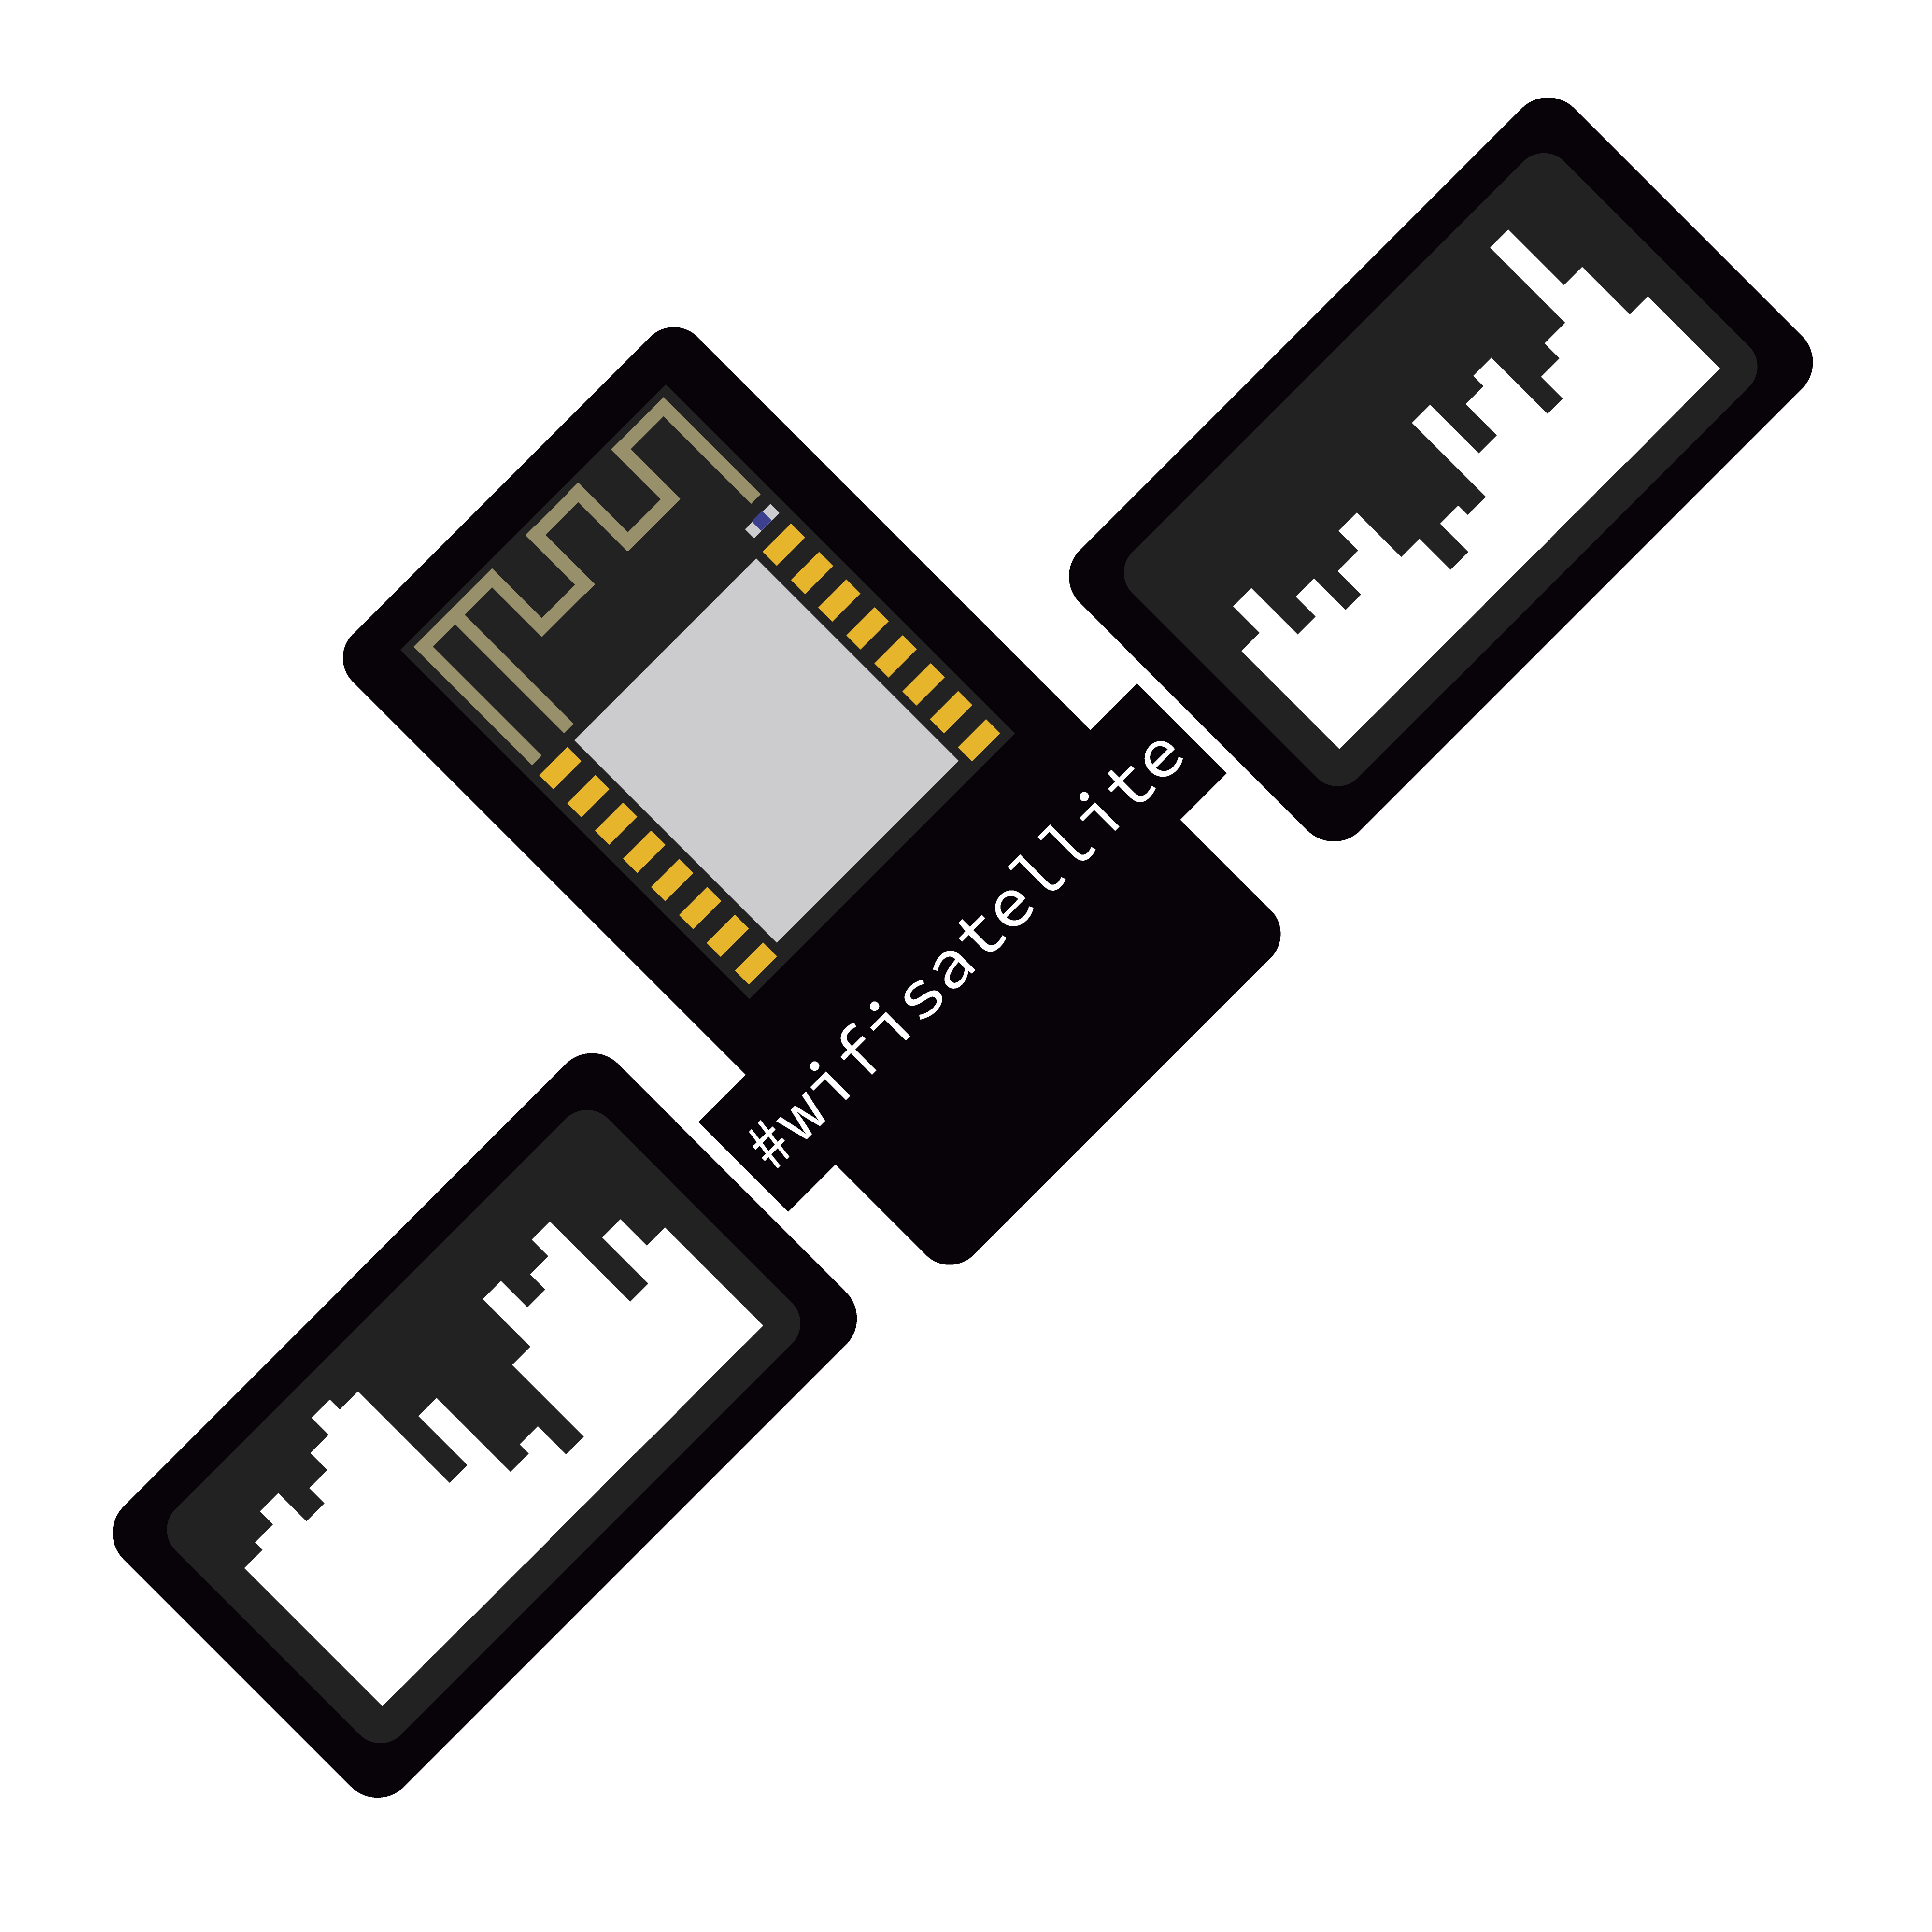 New WiFi Satellite #35c3 | Hackaday io